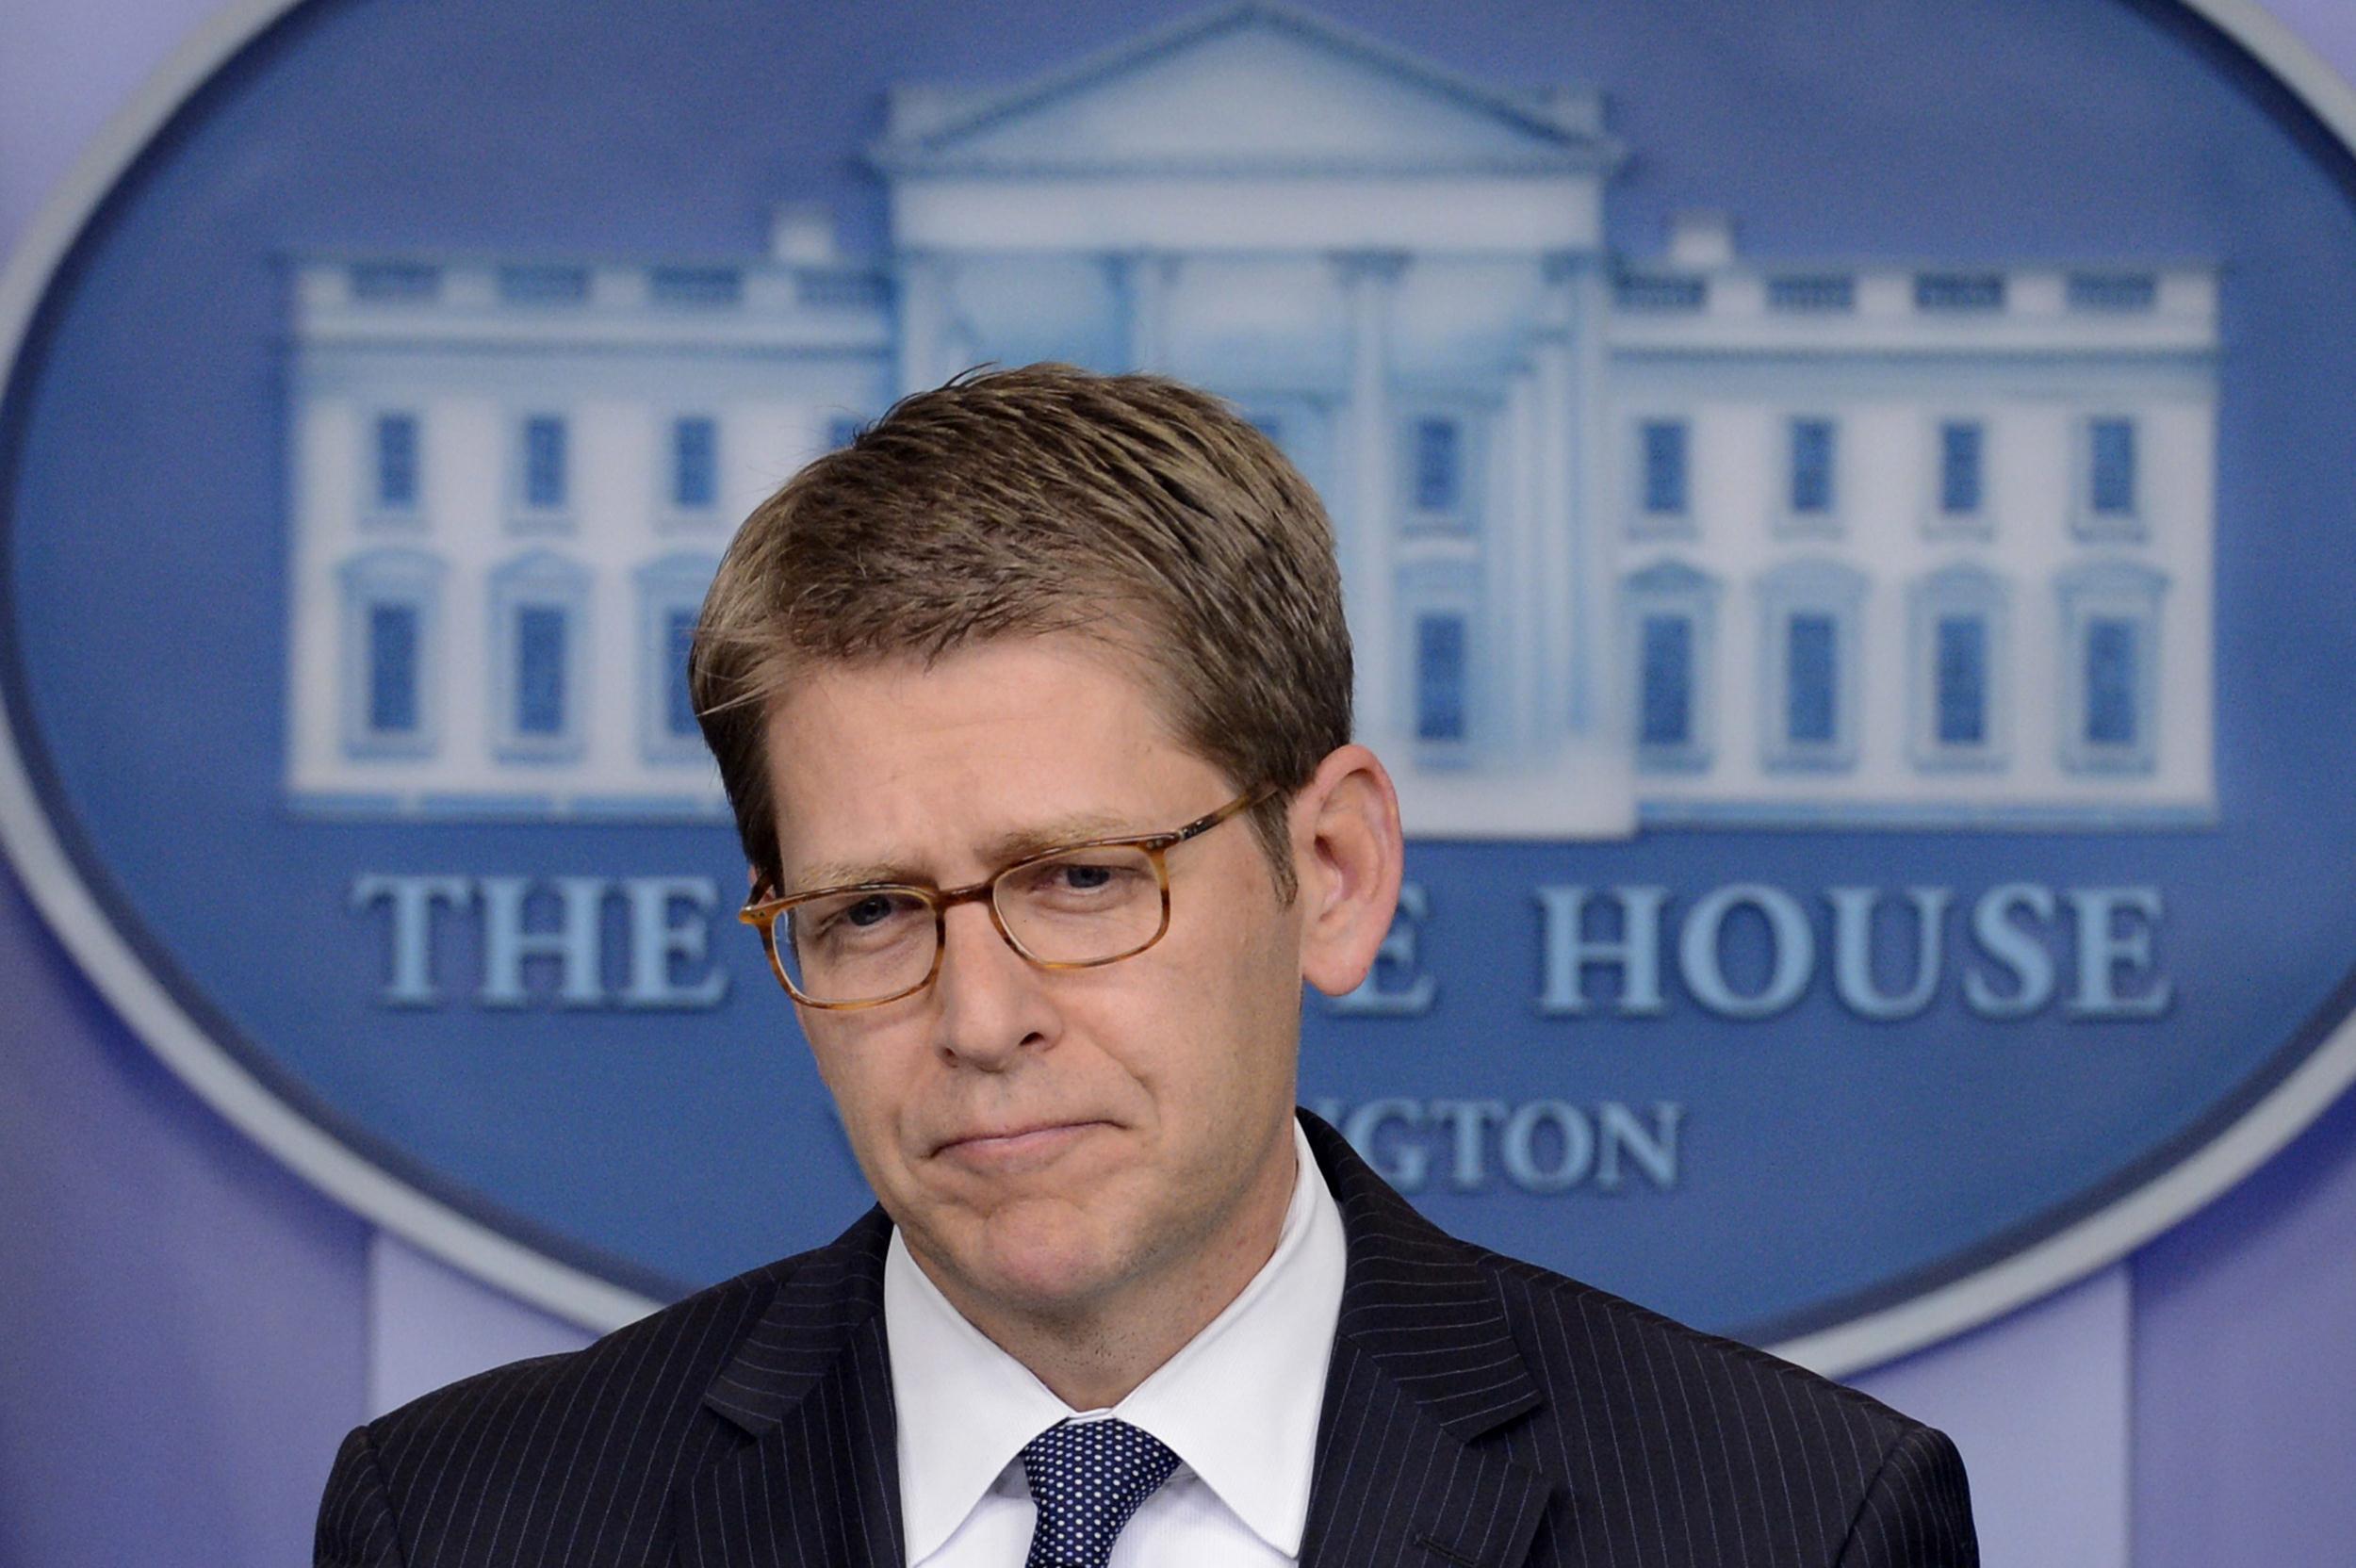 Image: White House Press Secretary Jay Carney